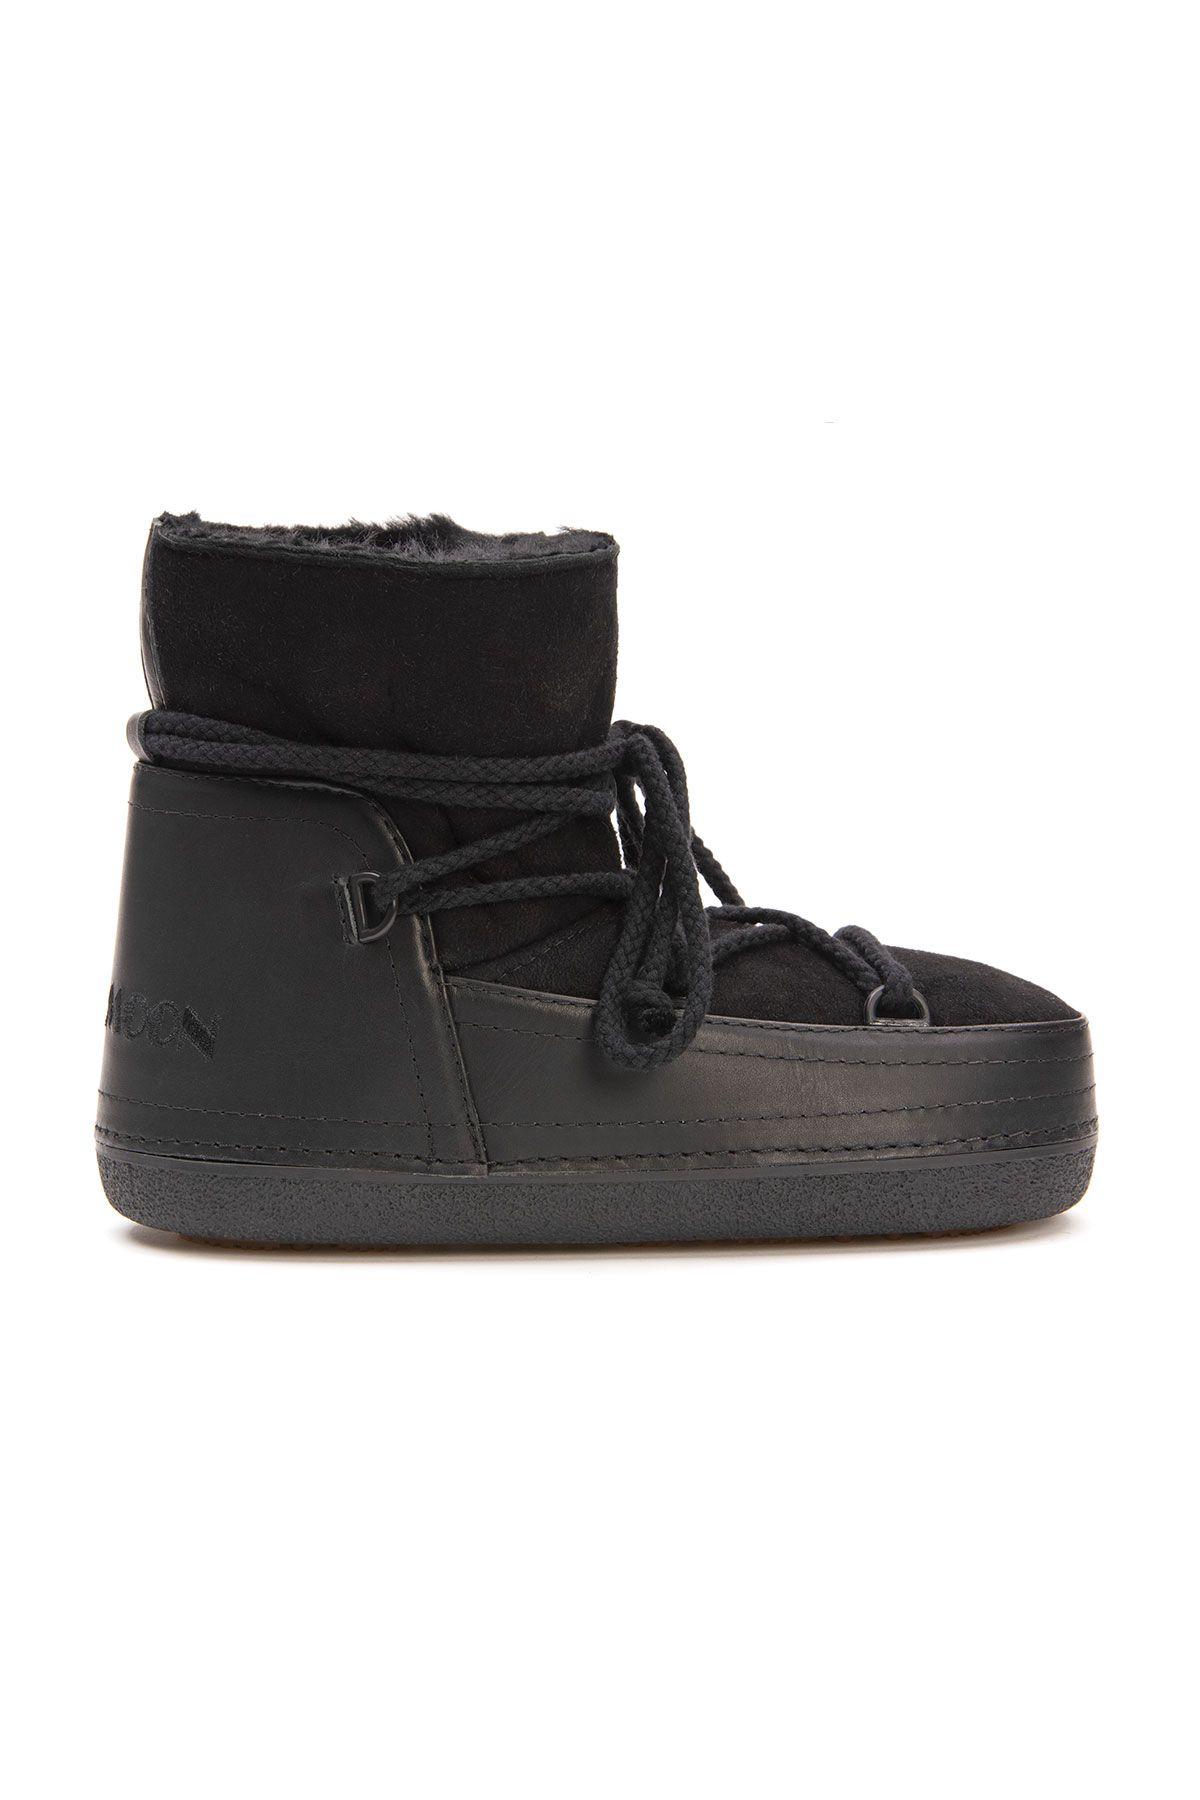 Cool Moon Genuine Sheepskin Women Snow Boots 251001 Black